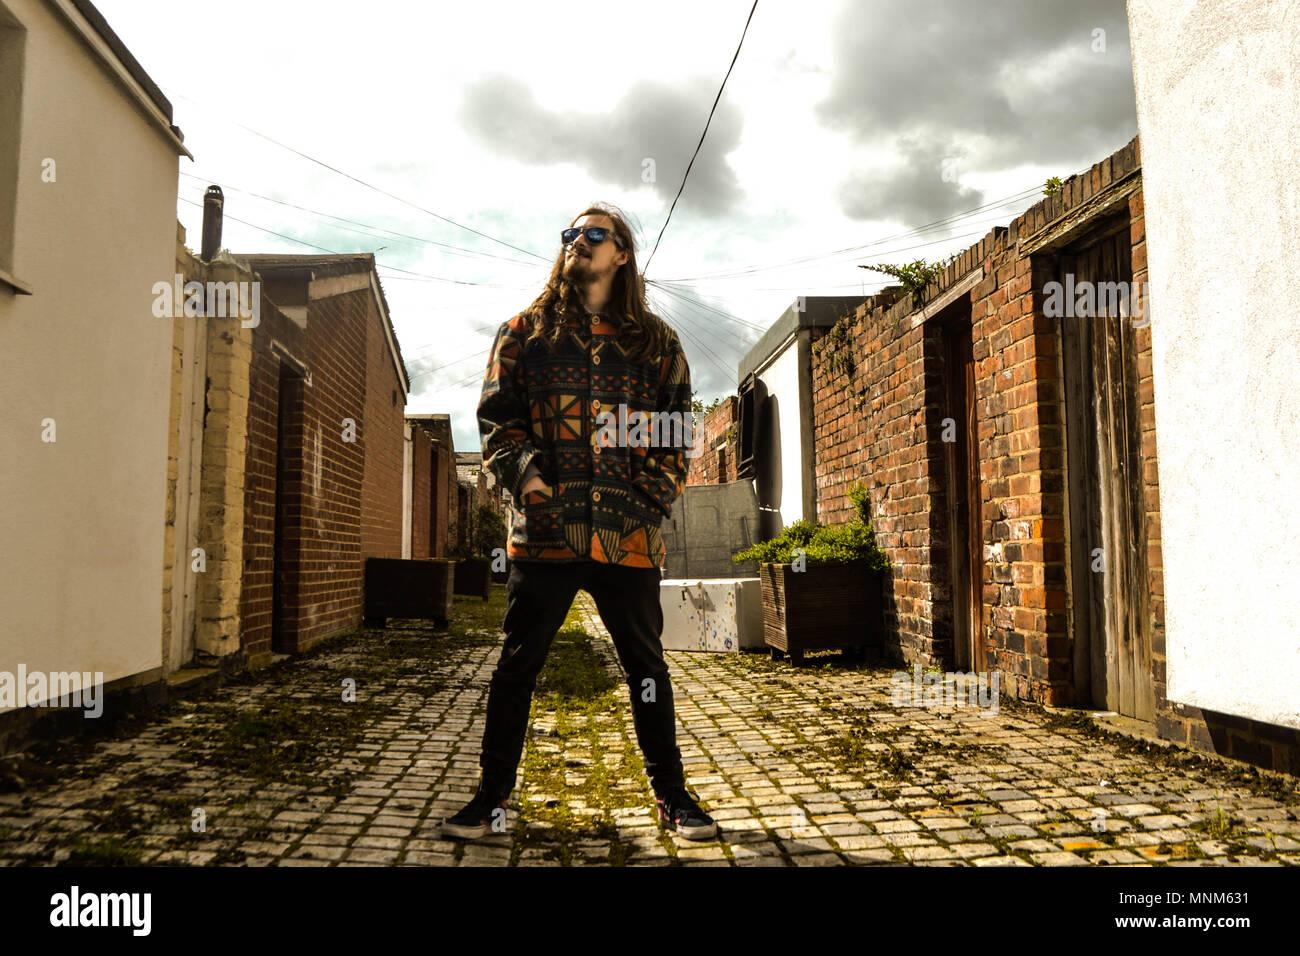 Stilvolle Mann in der Gasse ghetto Stand Stockbild